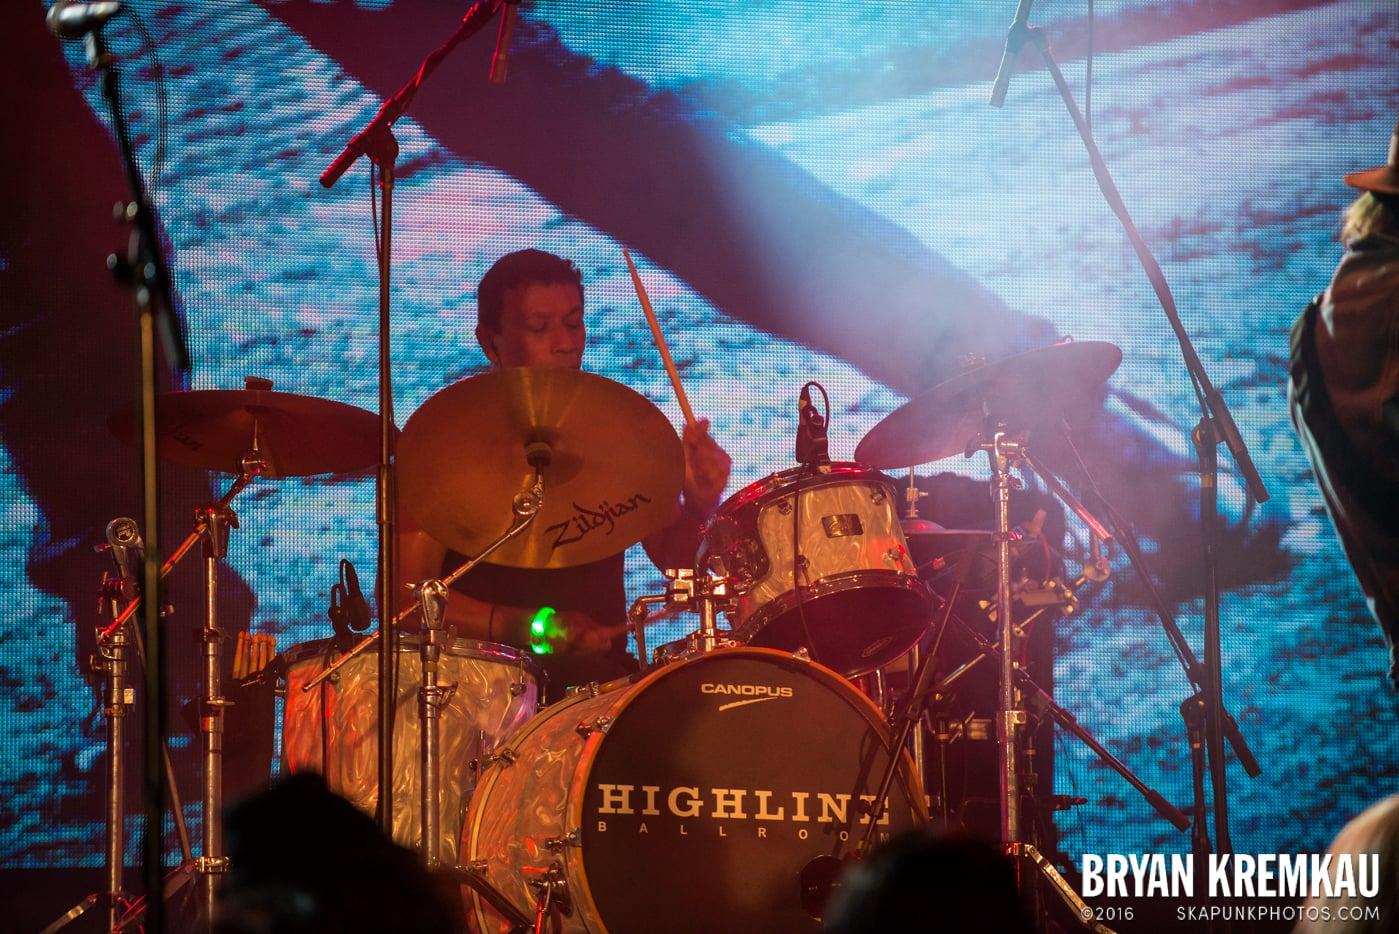 Willie Nile @ Highline Ballroom, NYC - 12.26.14 (22)